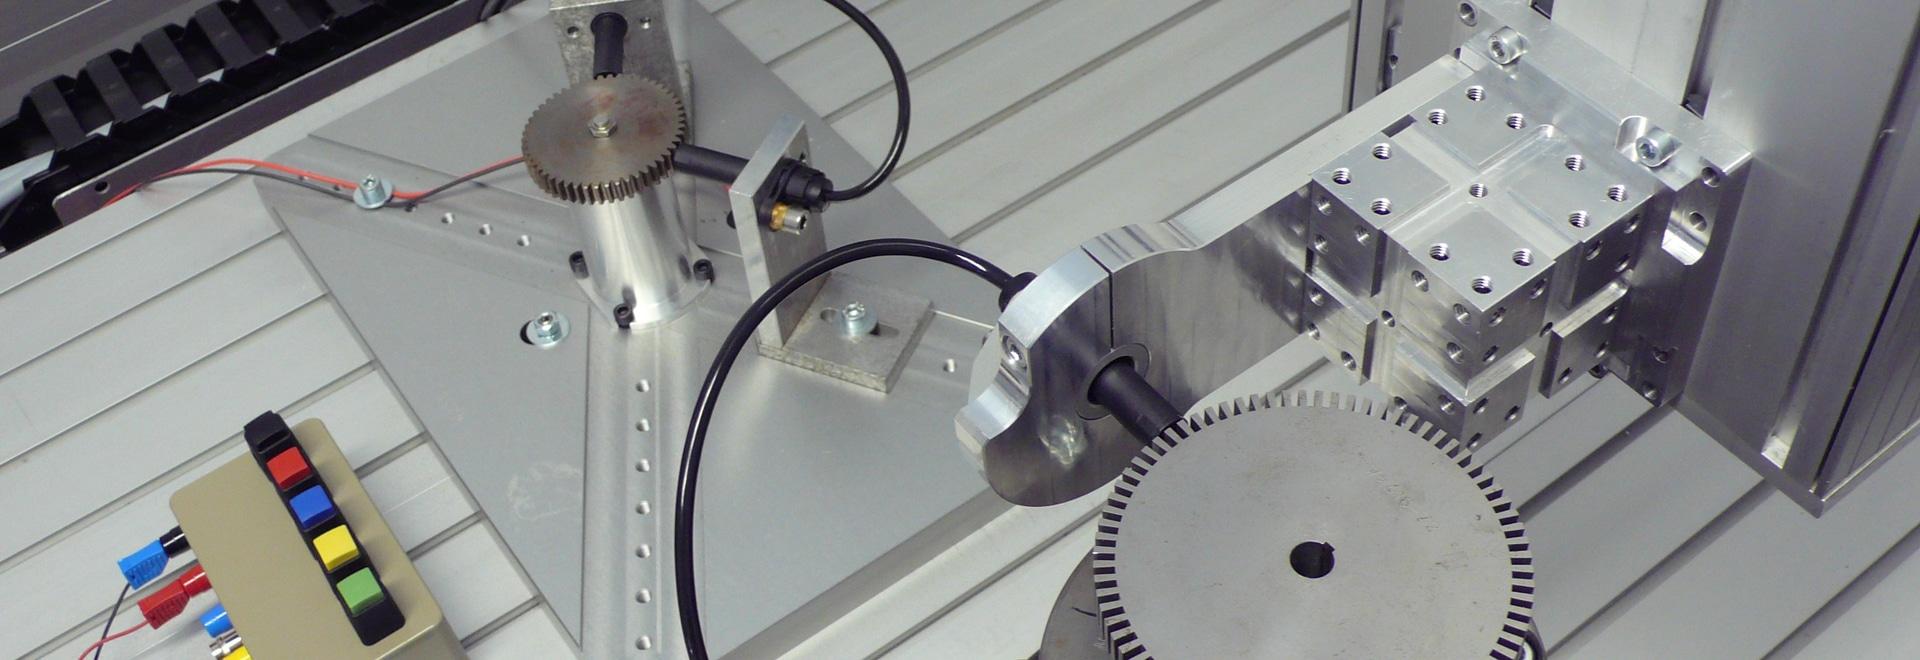 RHEINTACHO Sensor-Mapping-Station